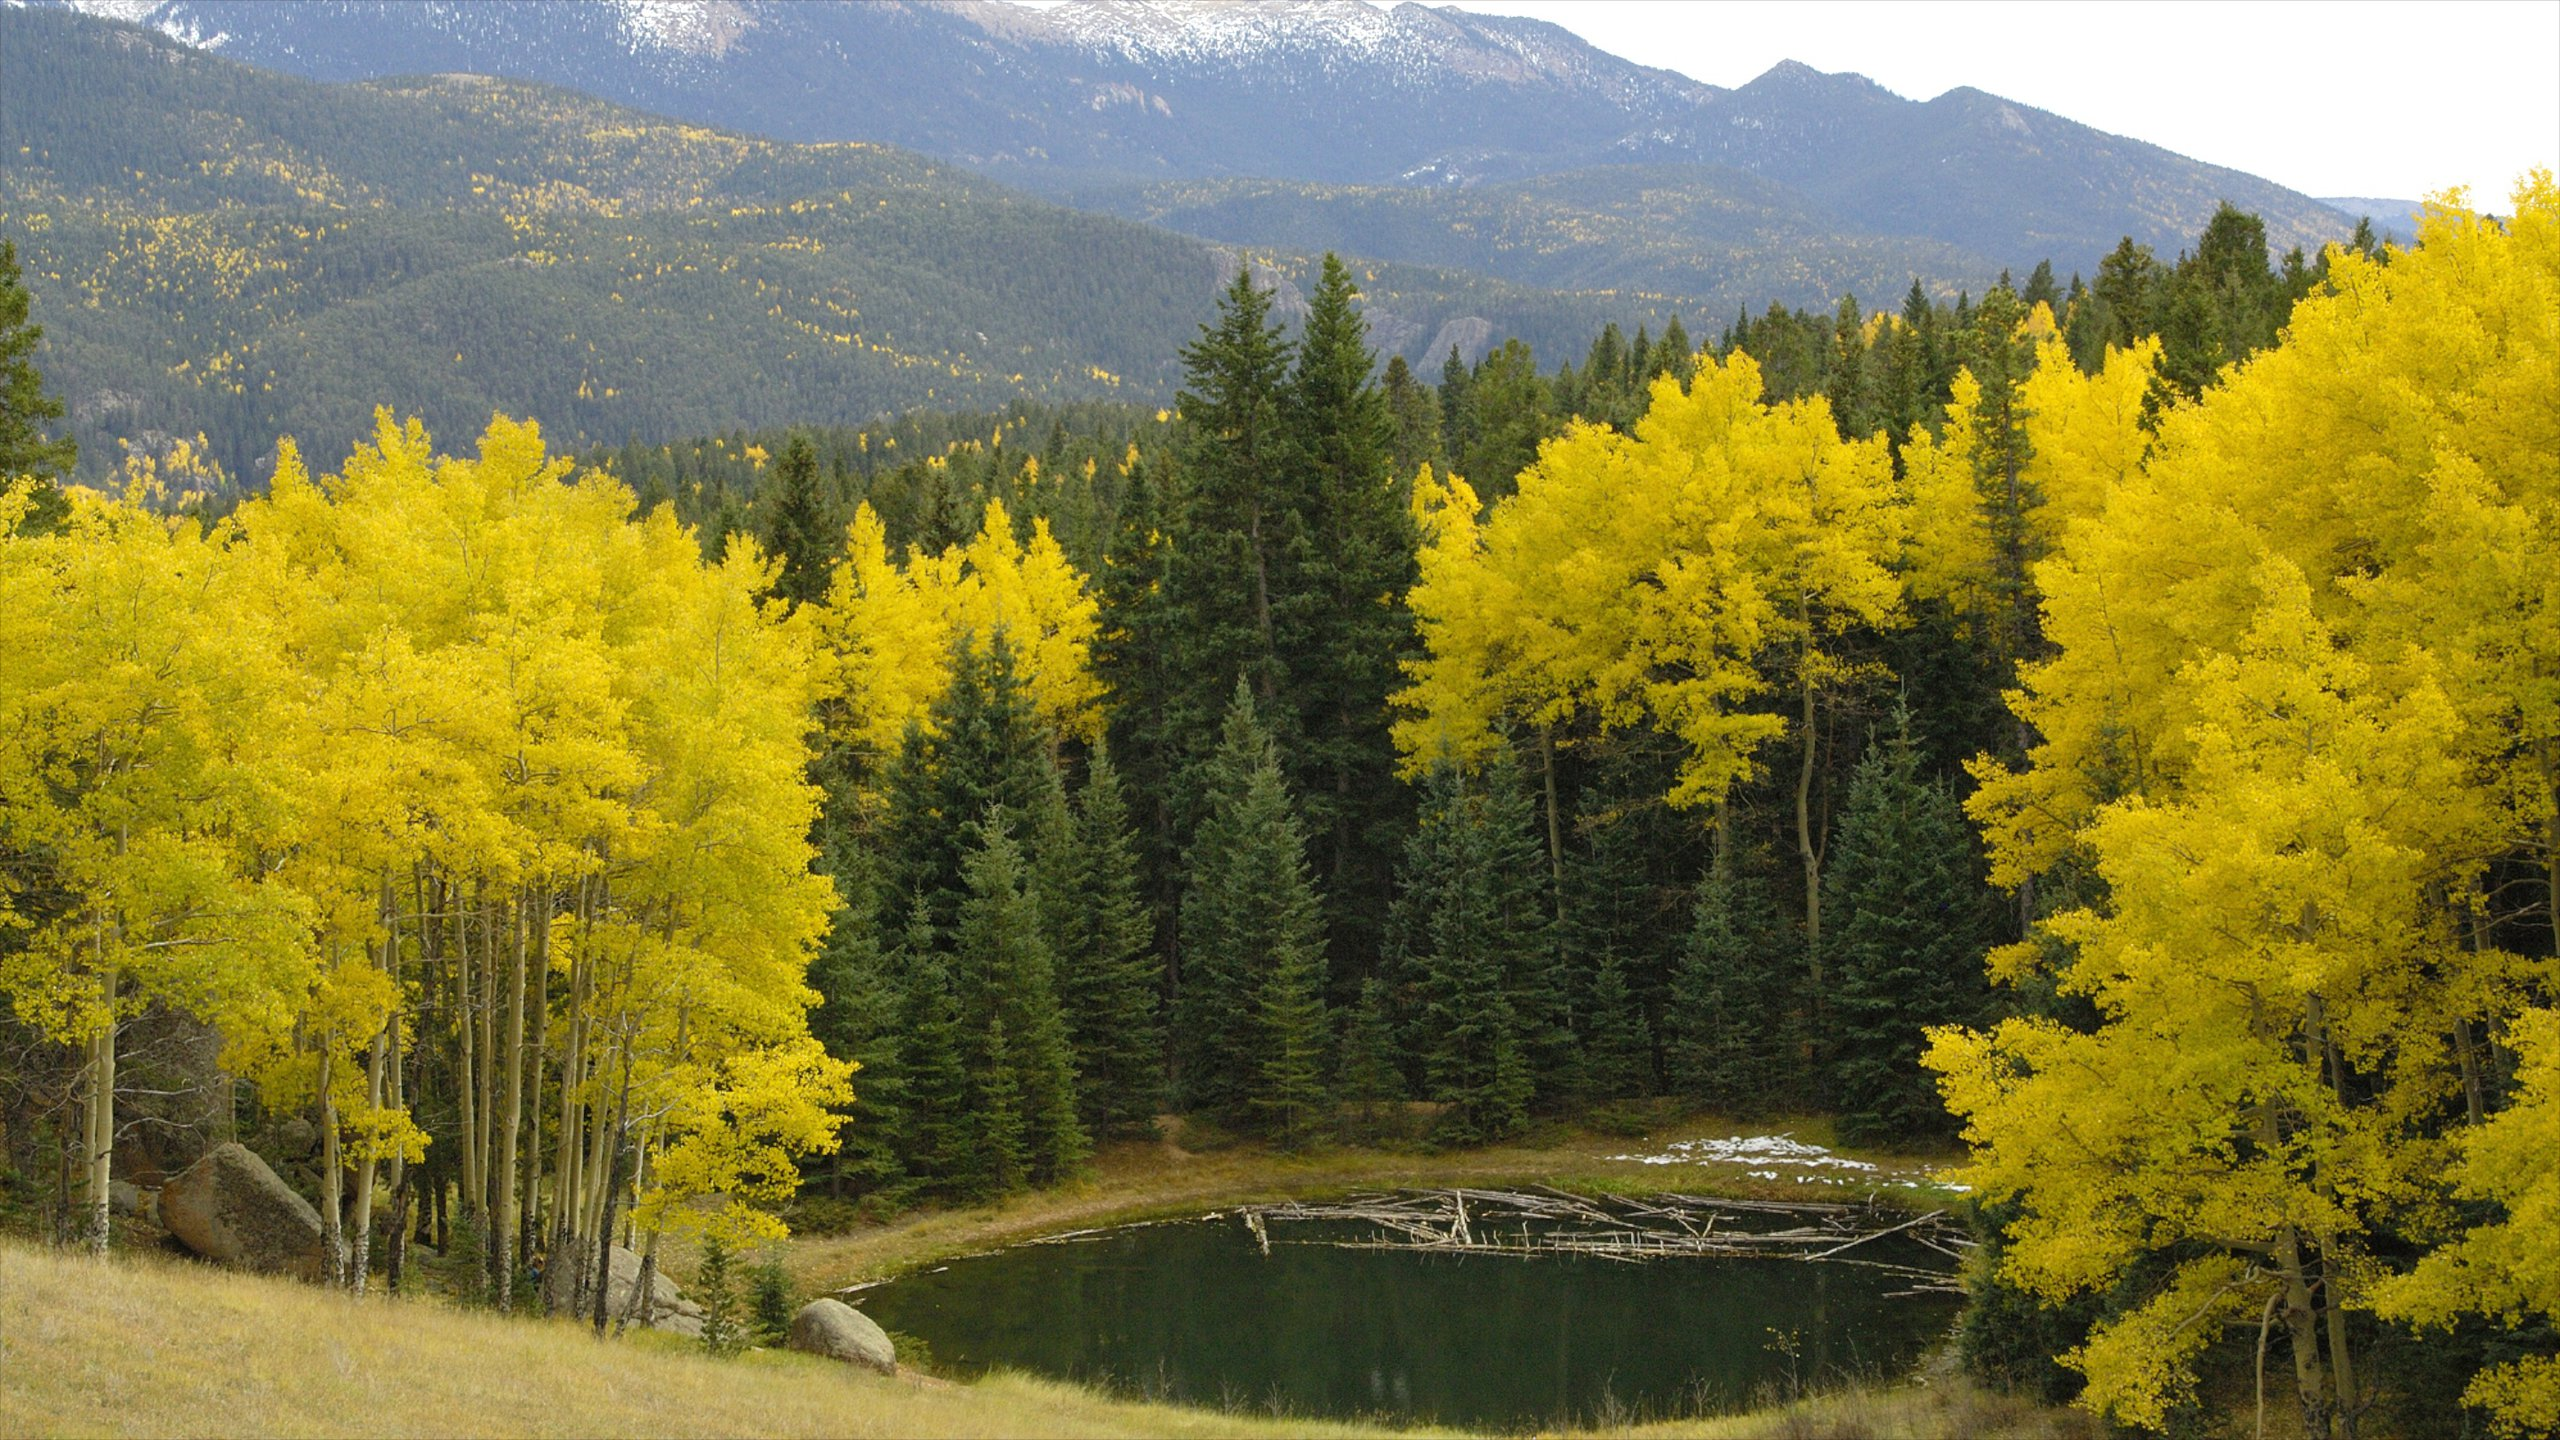 Divide, Colorado, United States of America